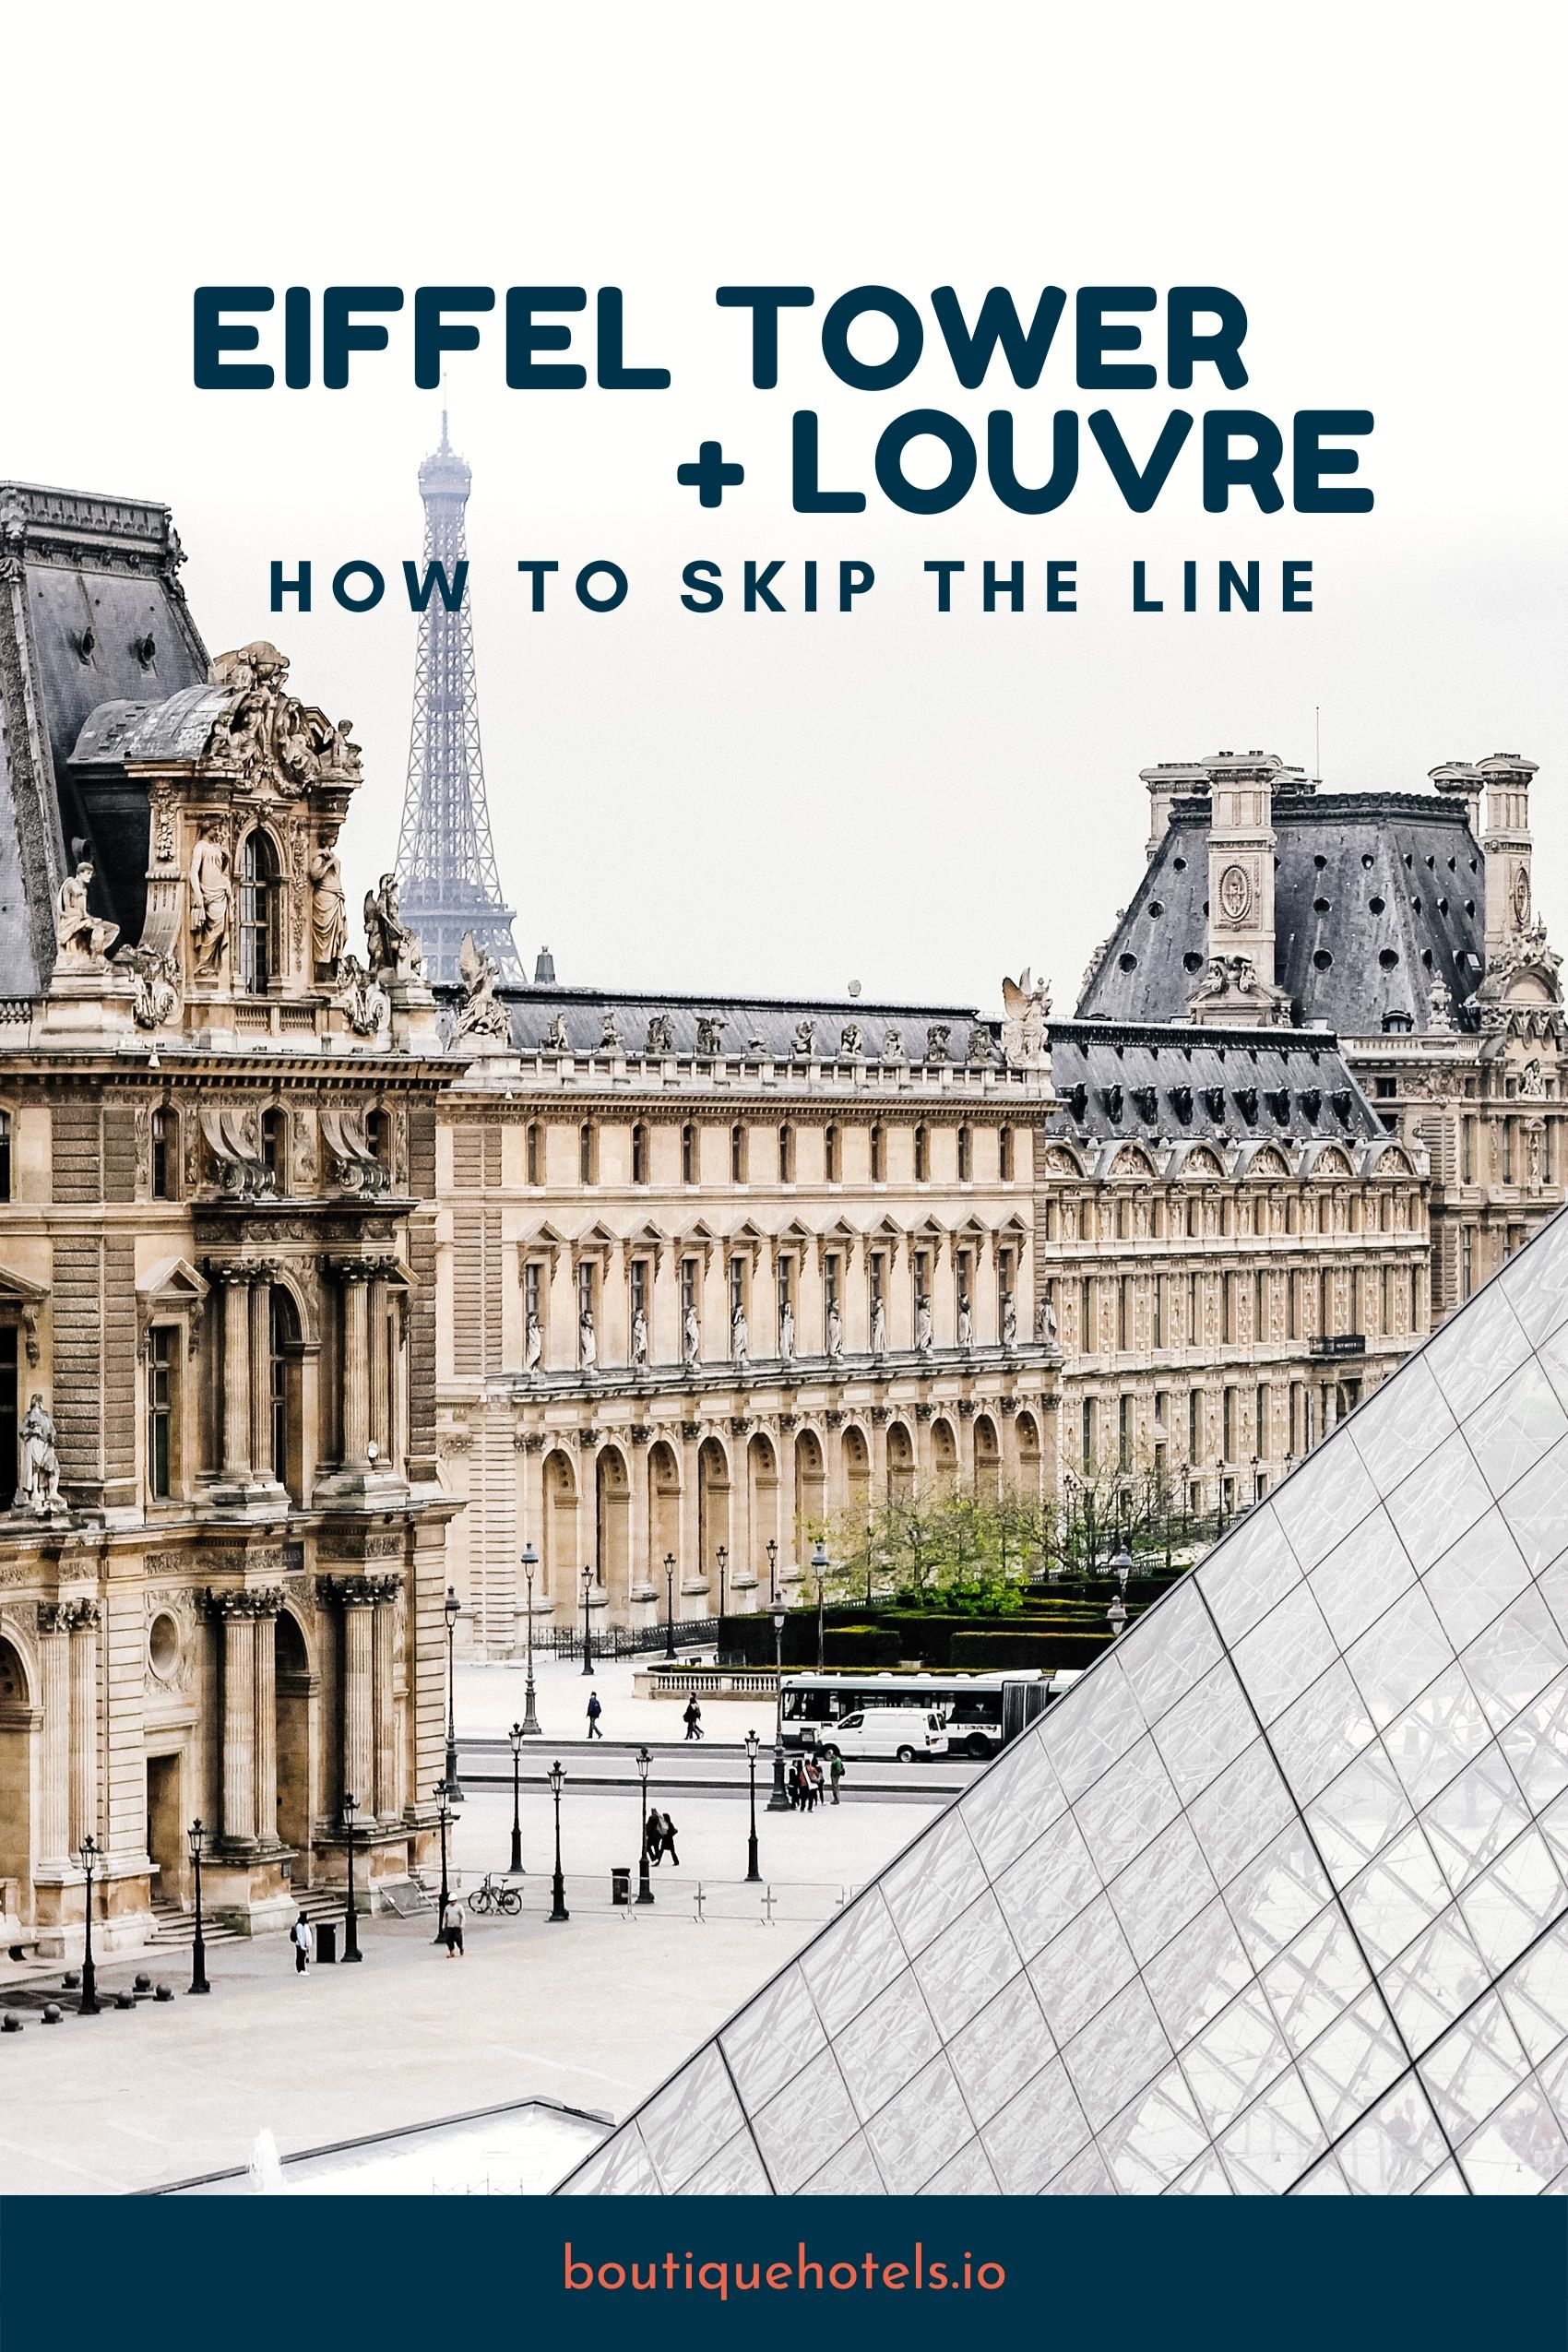 Eiffel Tower & Louvre Museum